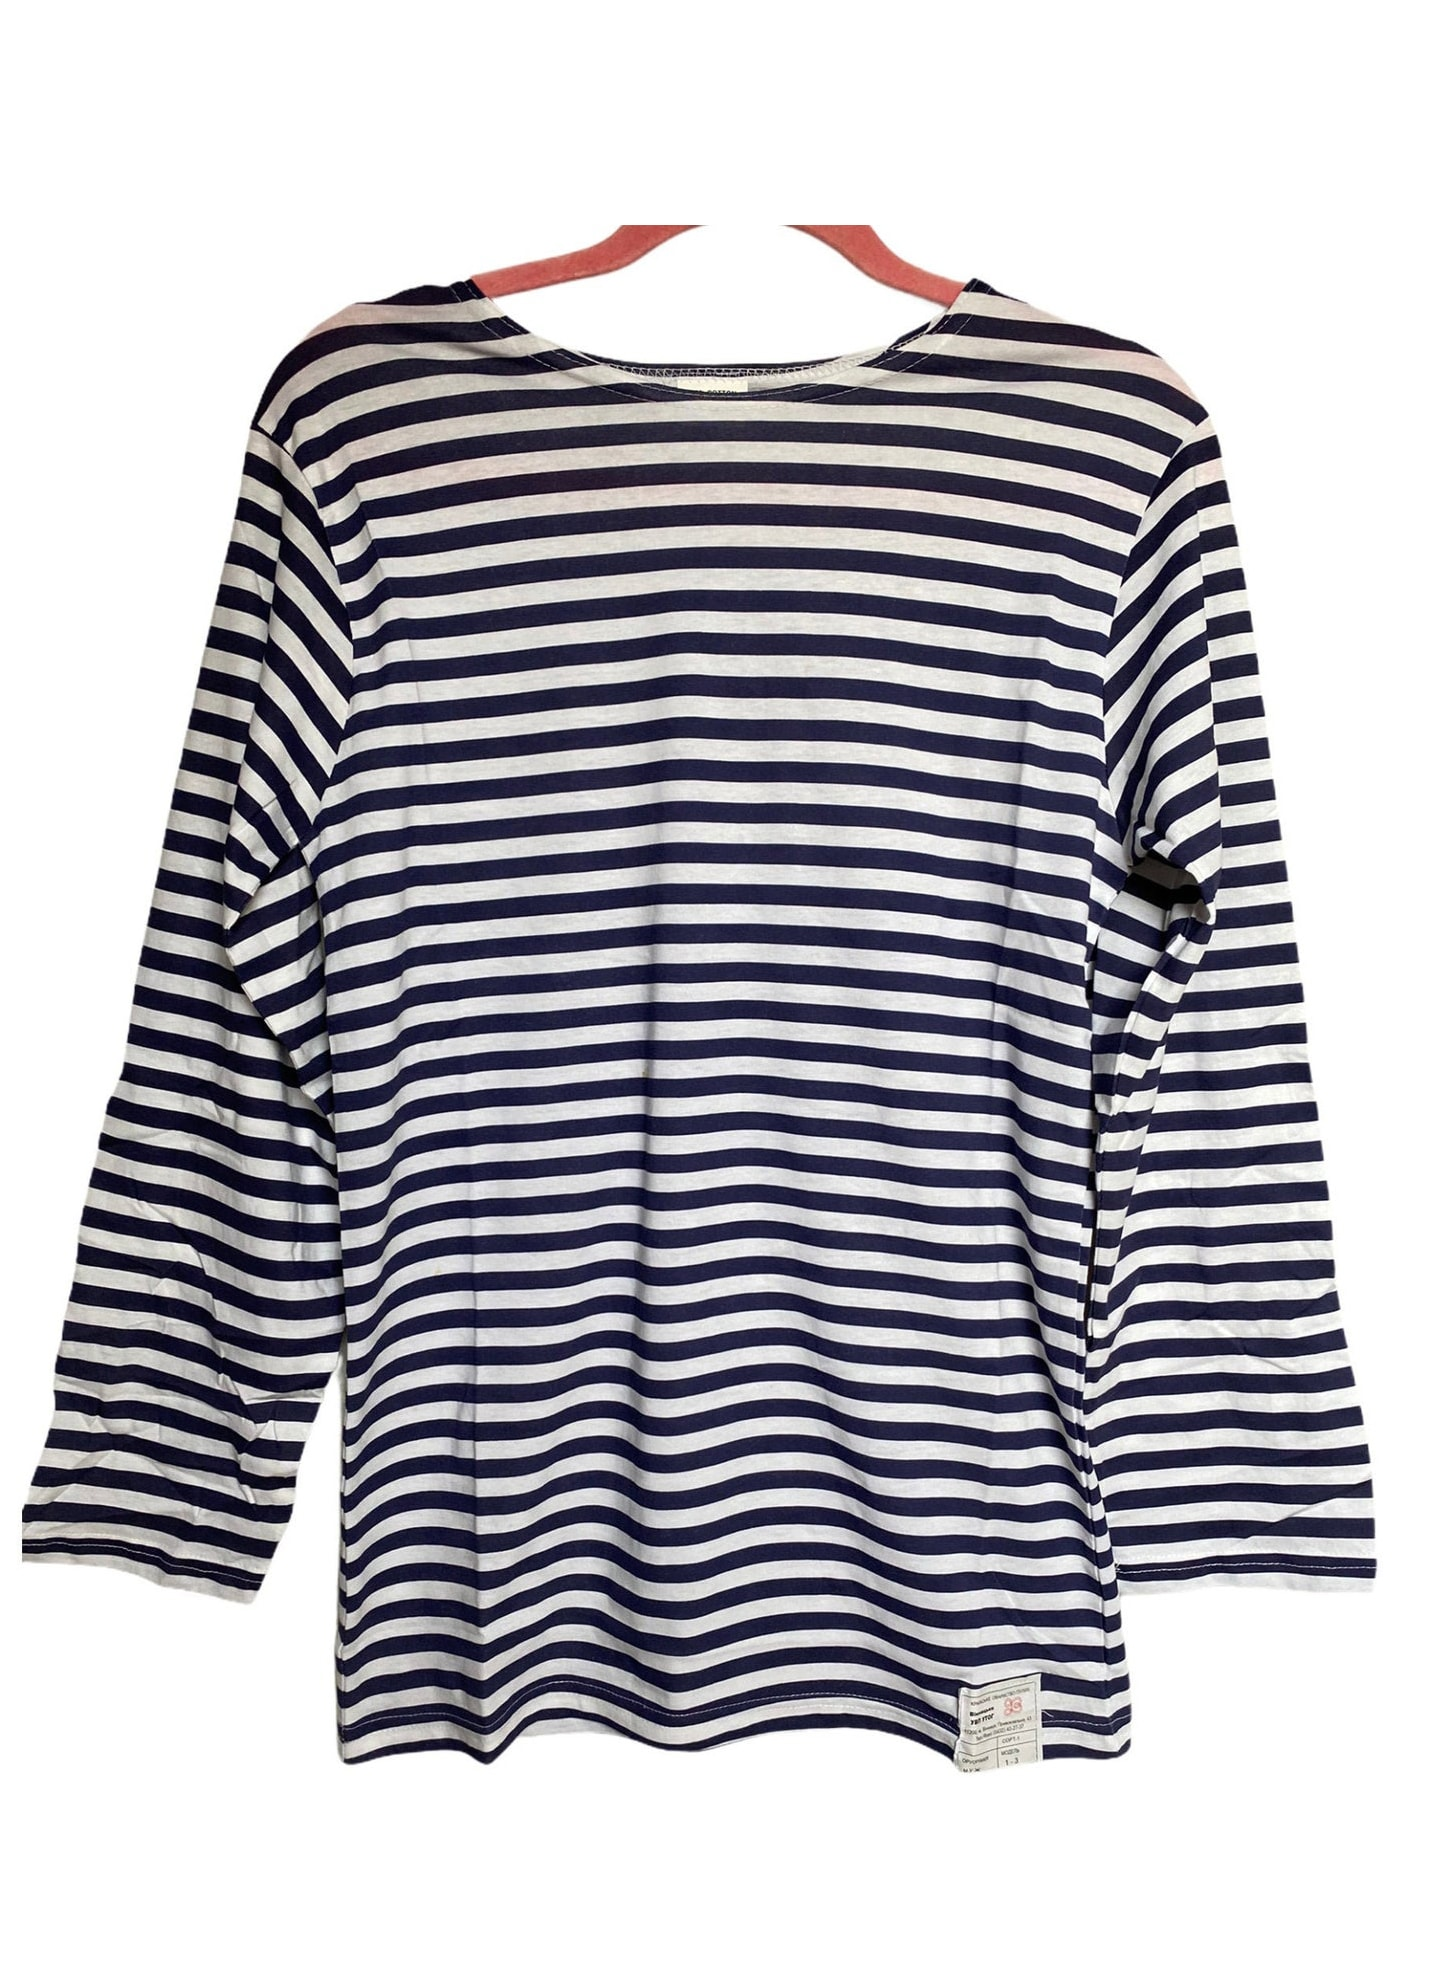 Vintage Russian Stripe Long Sleeve T-shirt